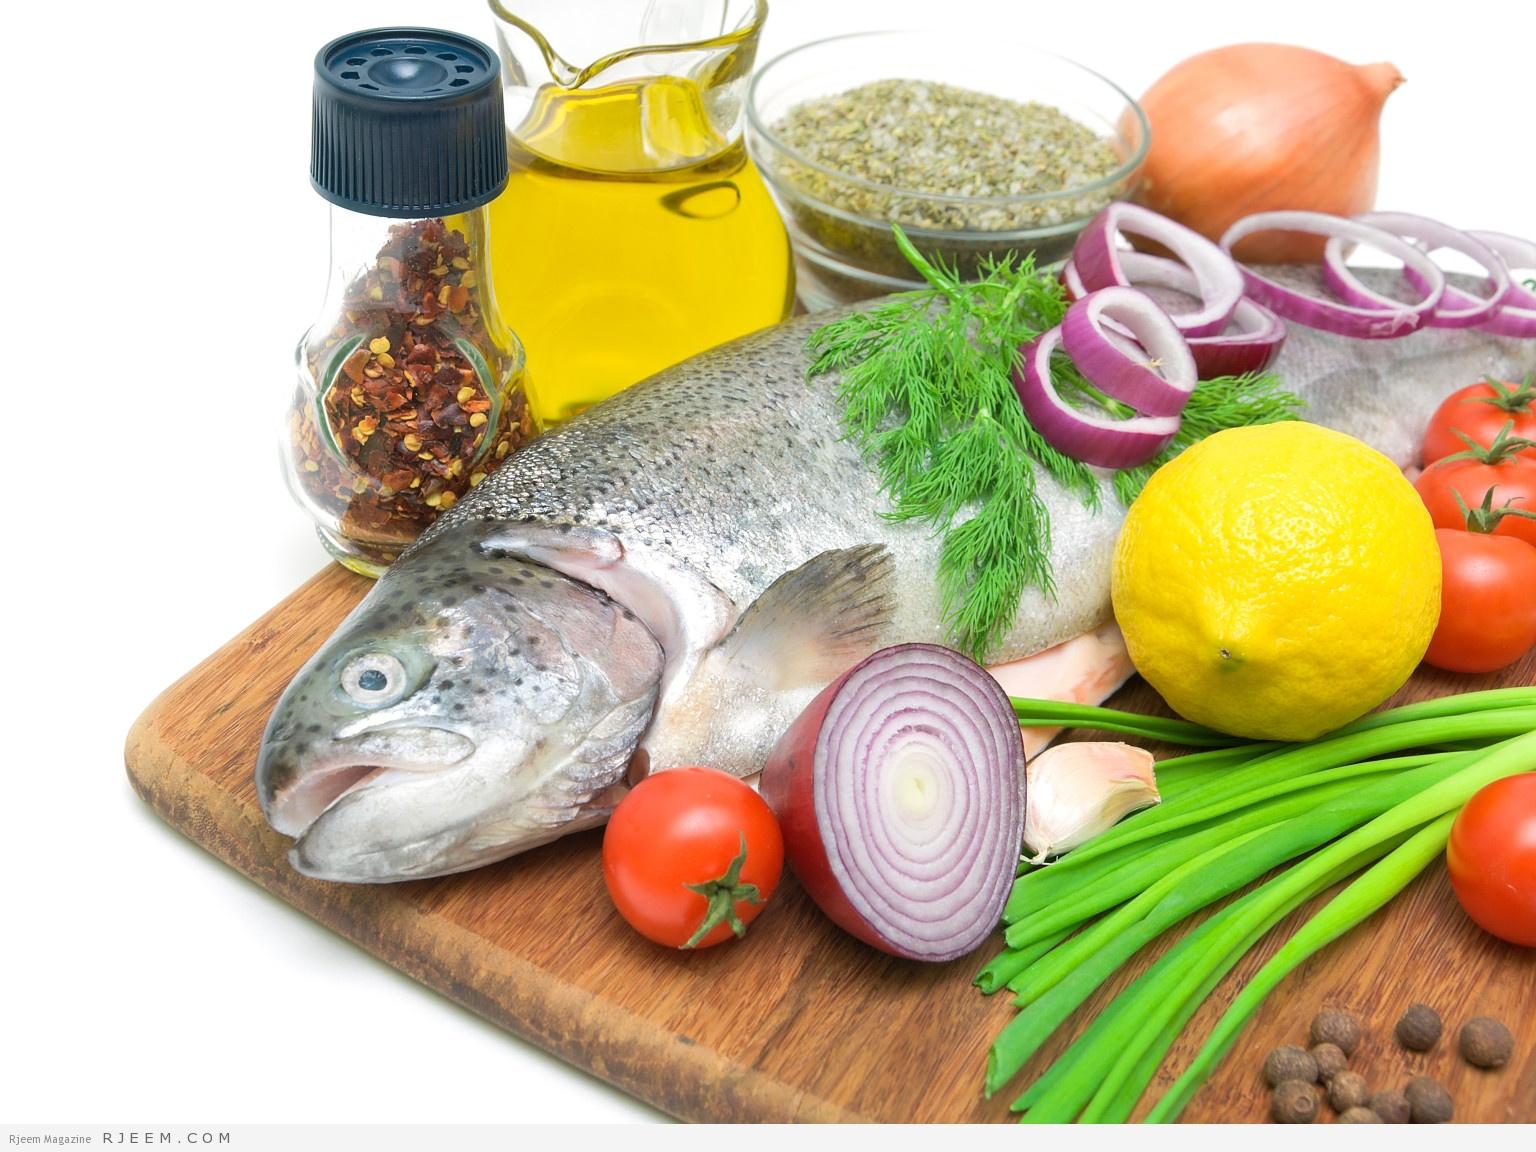 Photo of هذه الأطعمة تساعد في إنقاص الوزن والشعور بالشبع